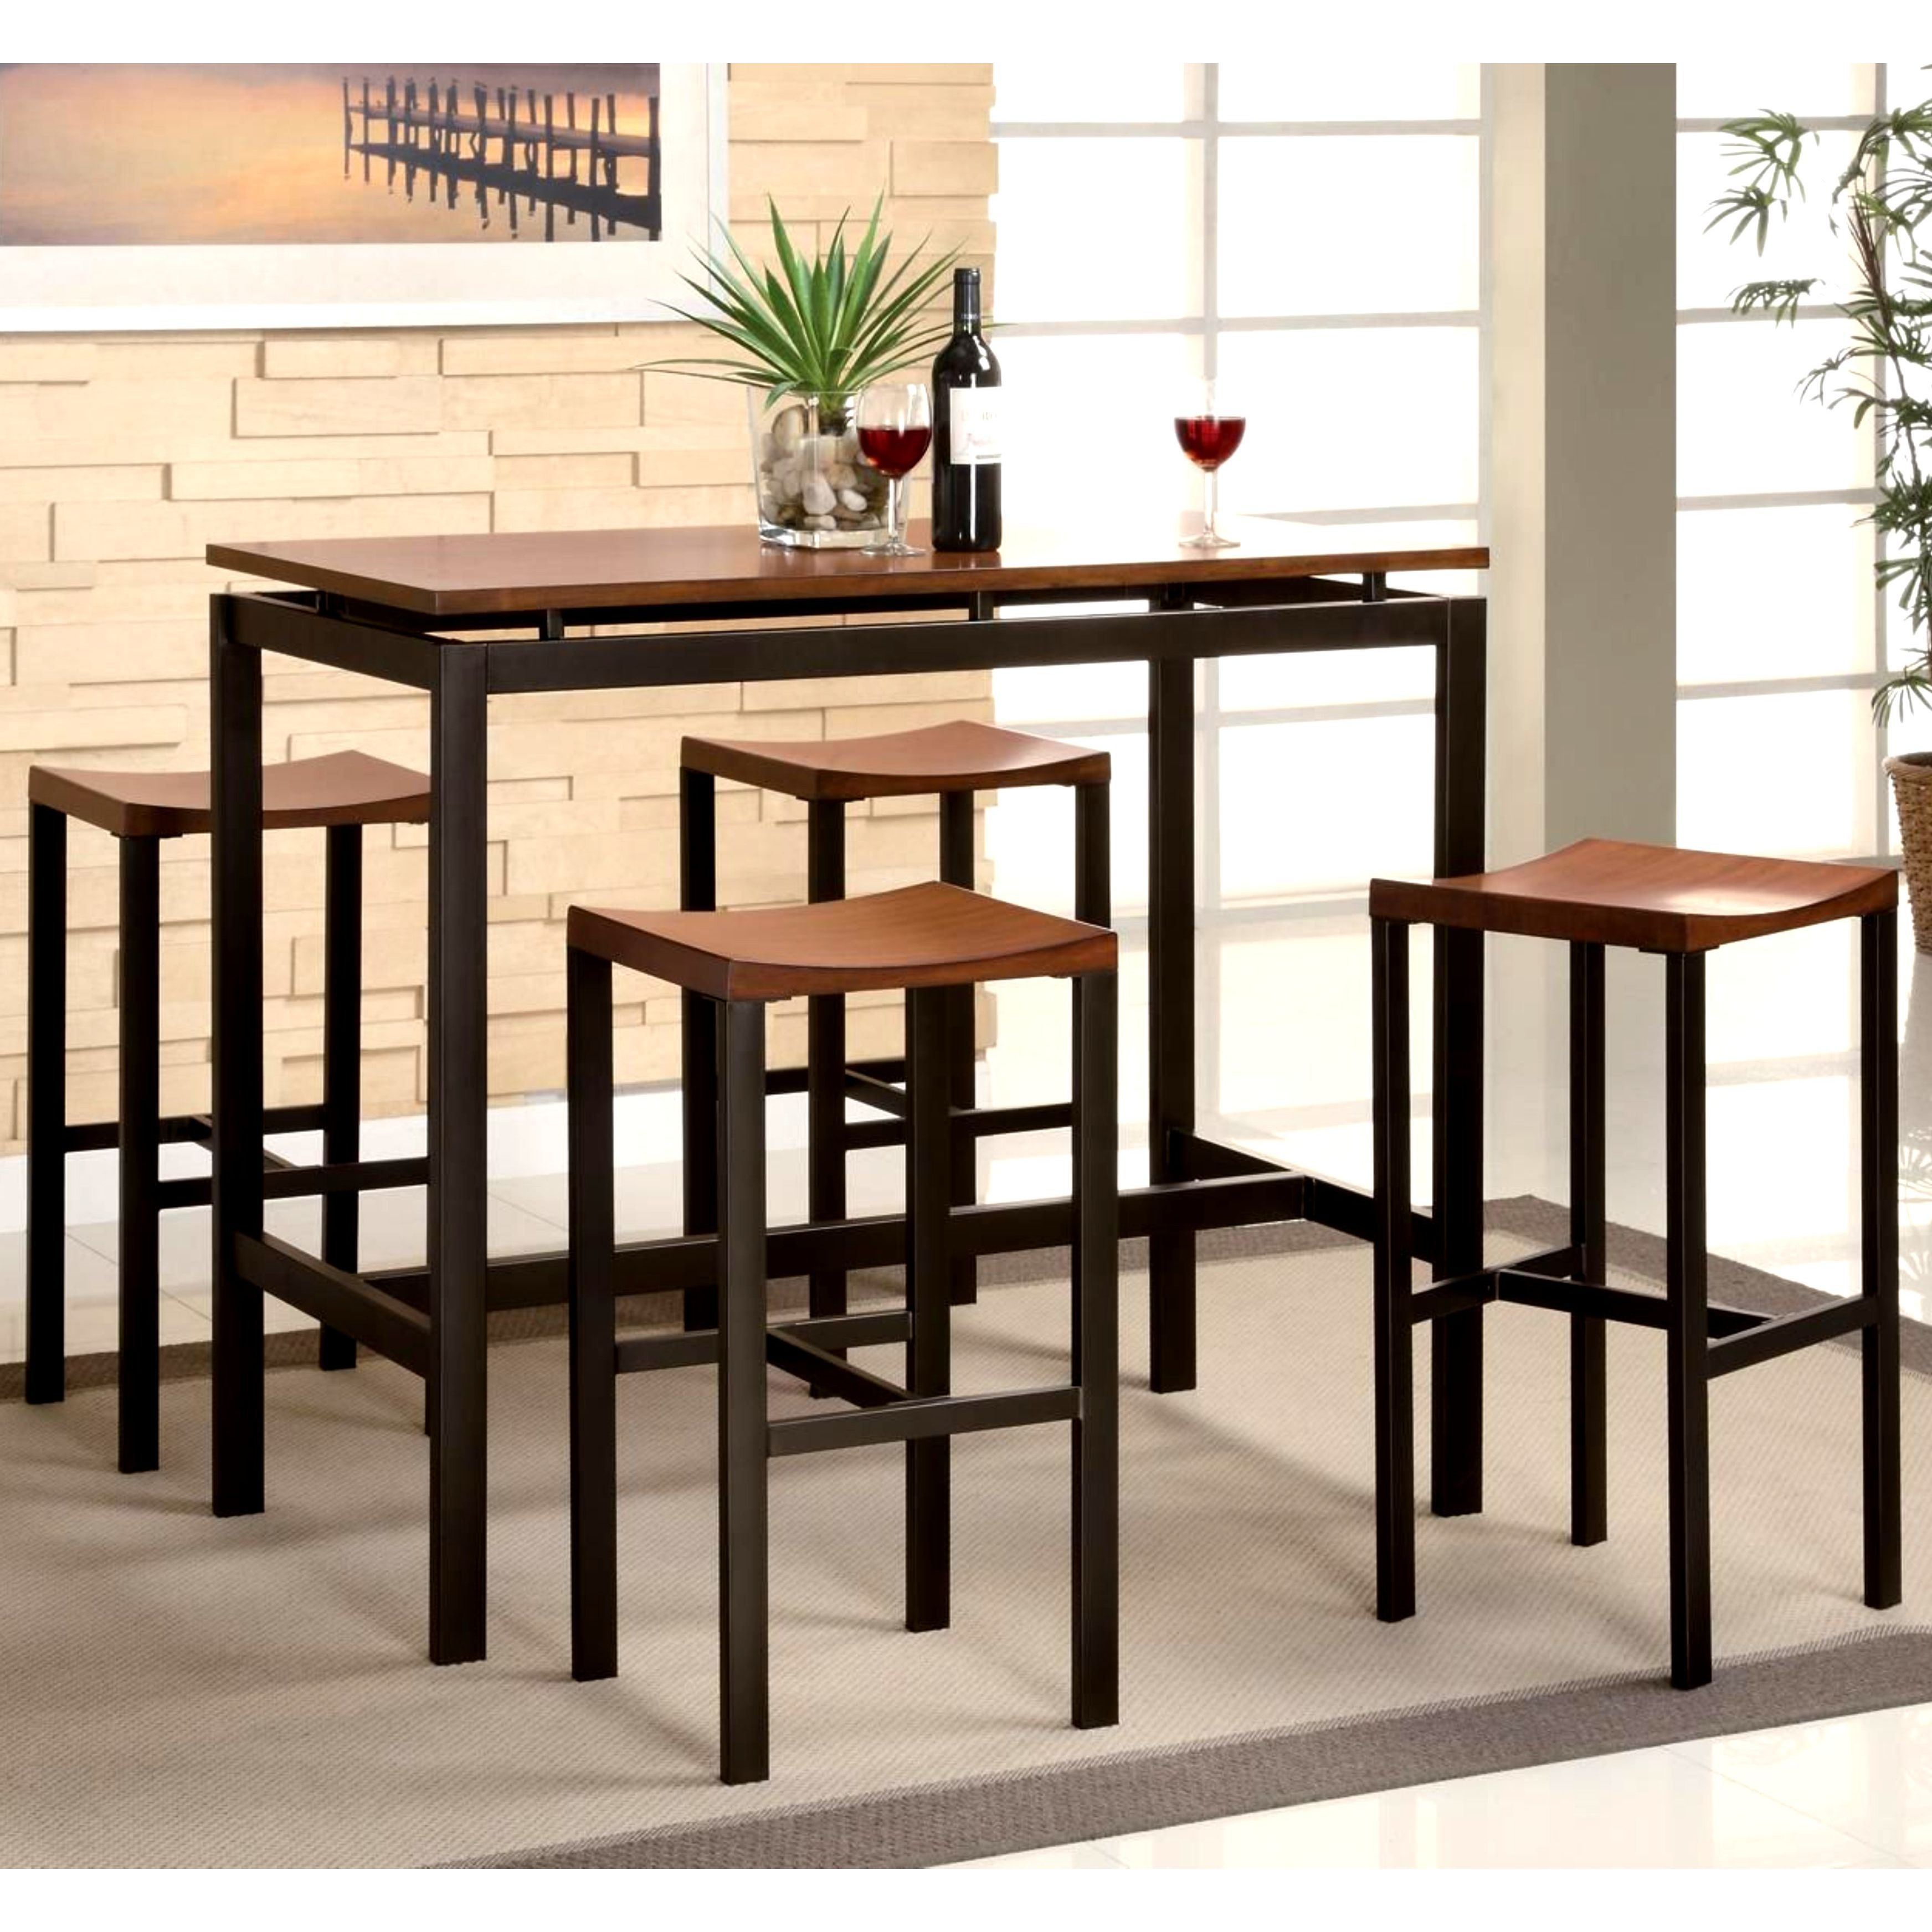 Phenomenal Casual Brown Floating Top Design 5 Piece Bar Height Dining Set Uwap Interior Chair Design Uwaporg